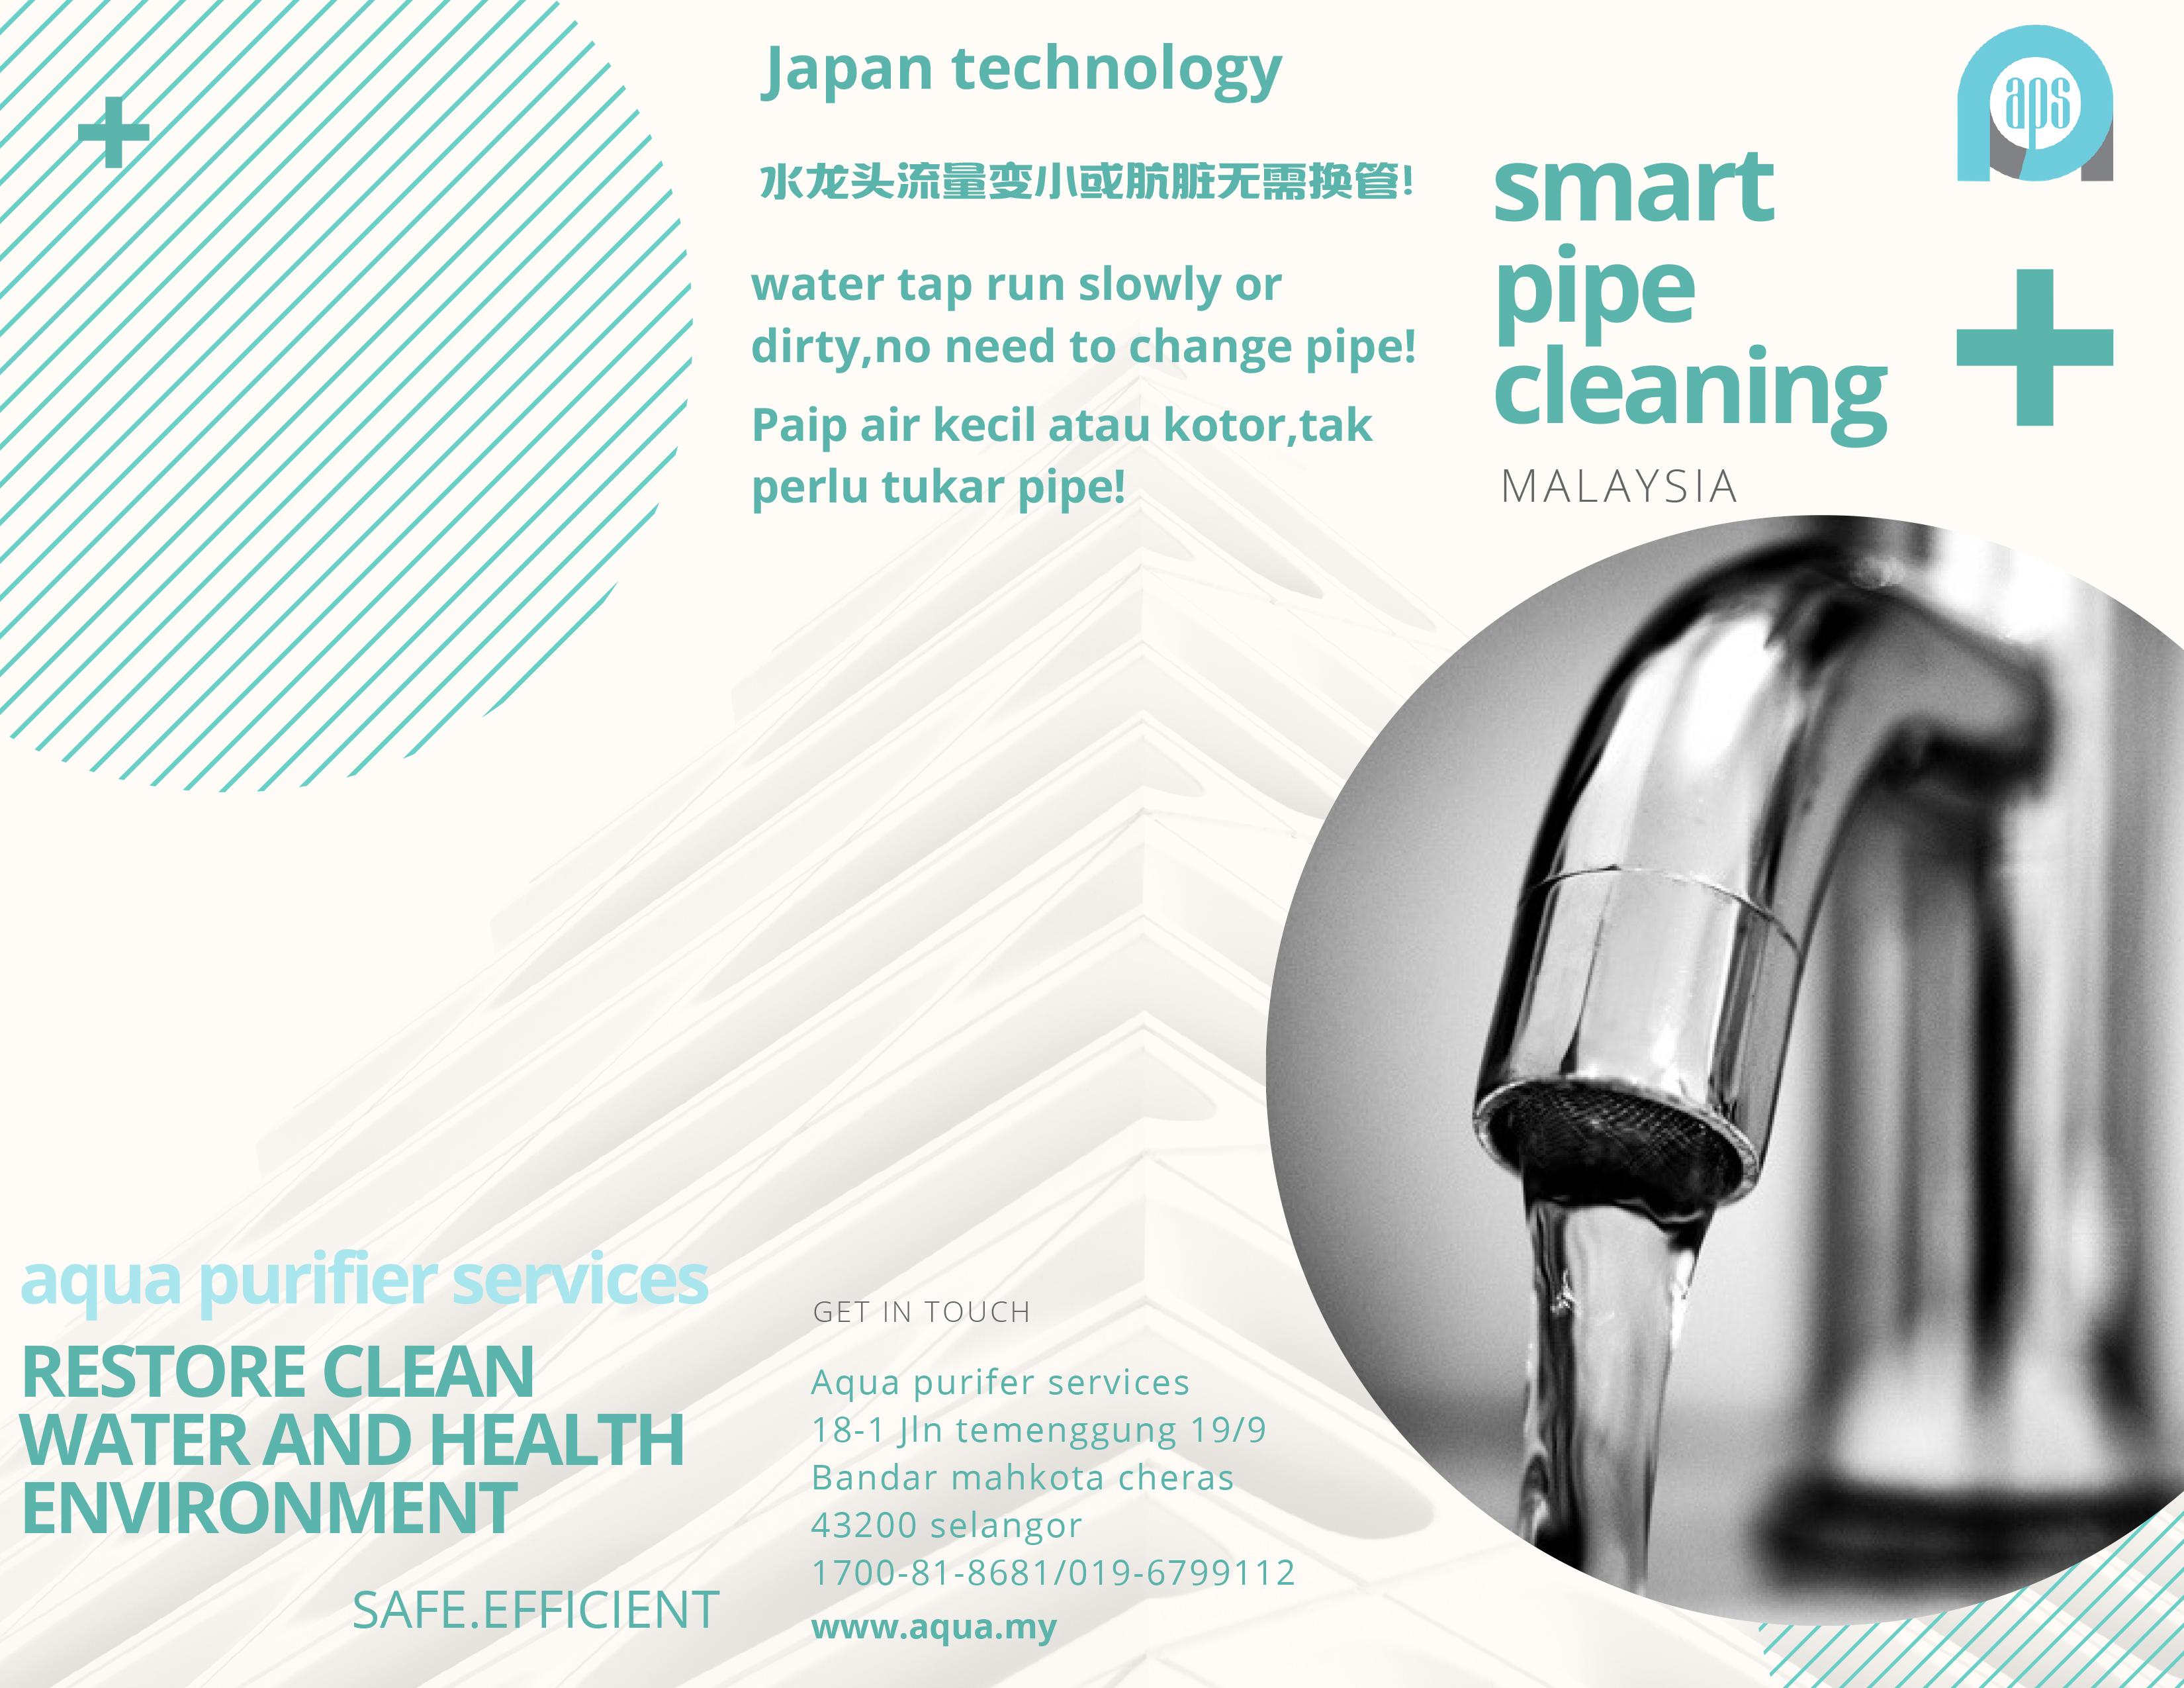 smart_pipe_cleaning-1.jpg